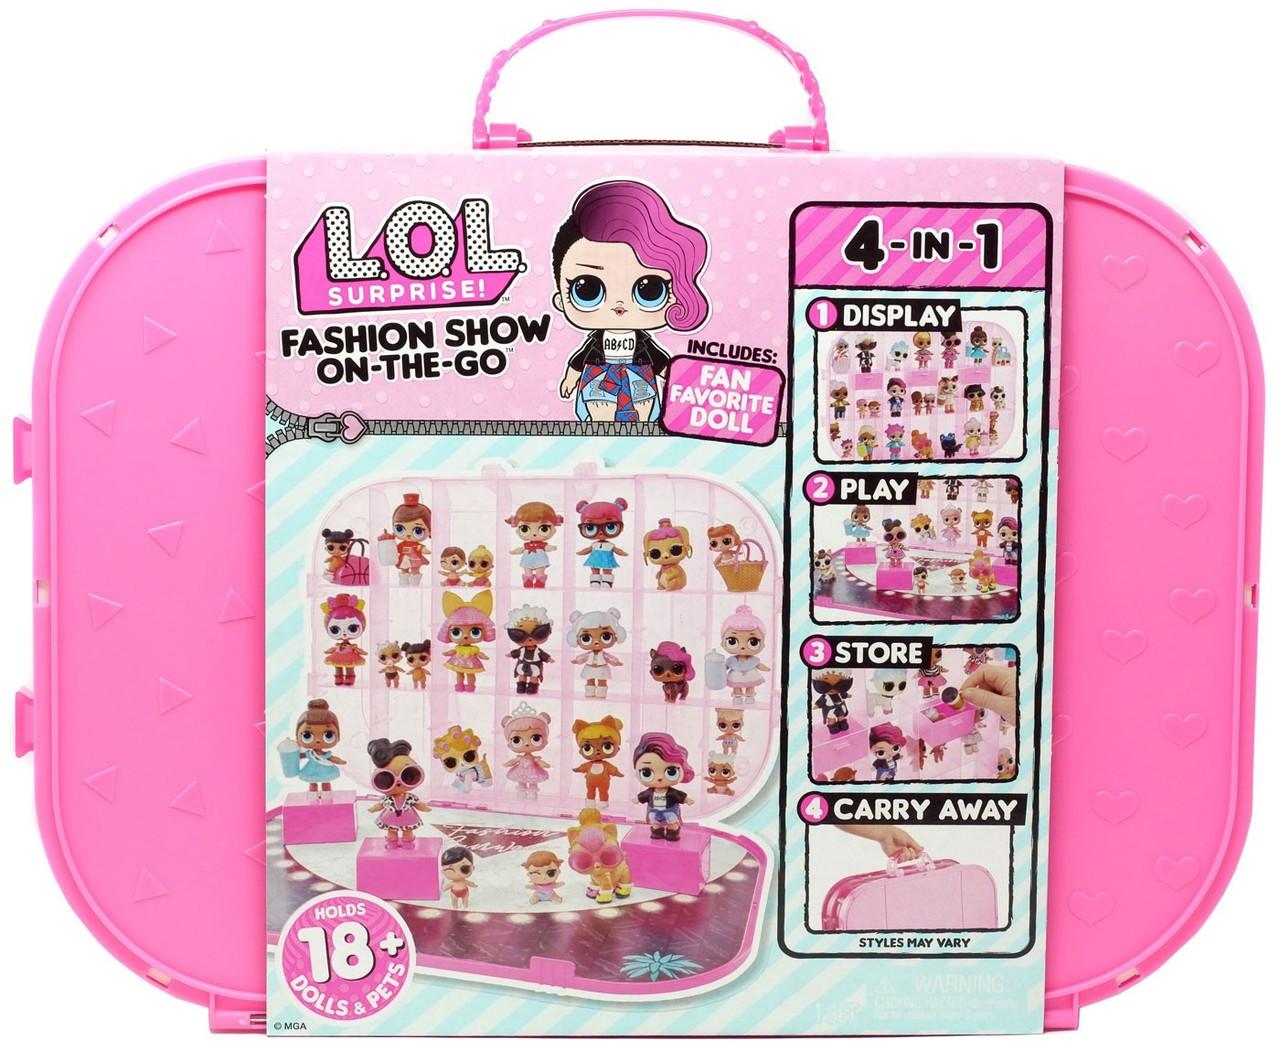 LOL Fashion Кеис Ярко-Розовый ЛОЛ Сюрприз 4-в-1